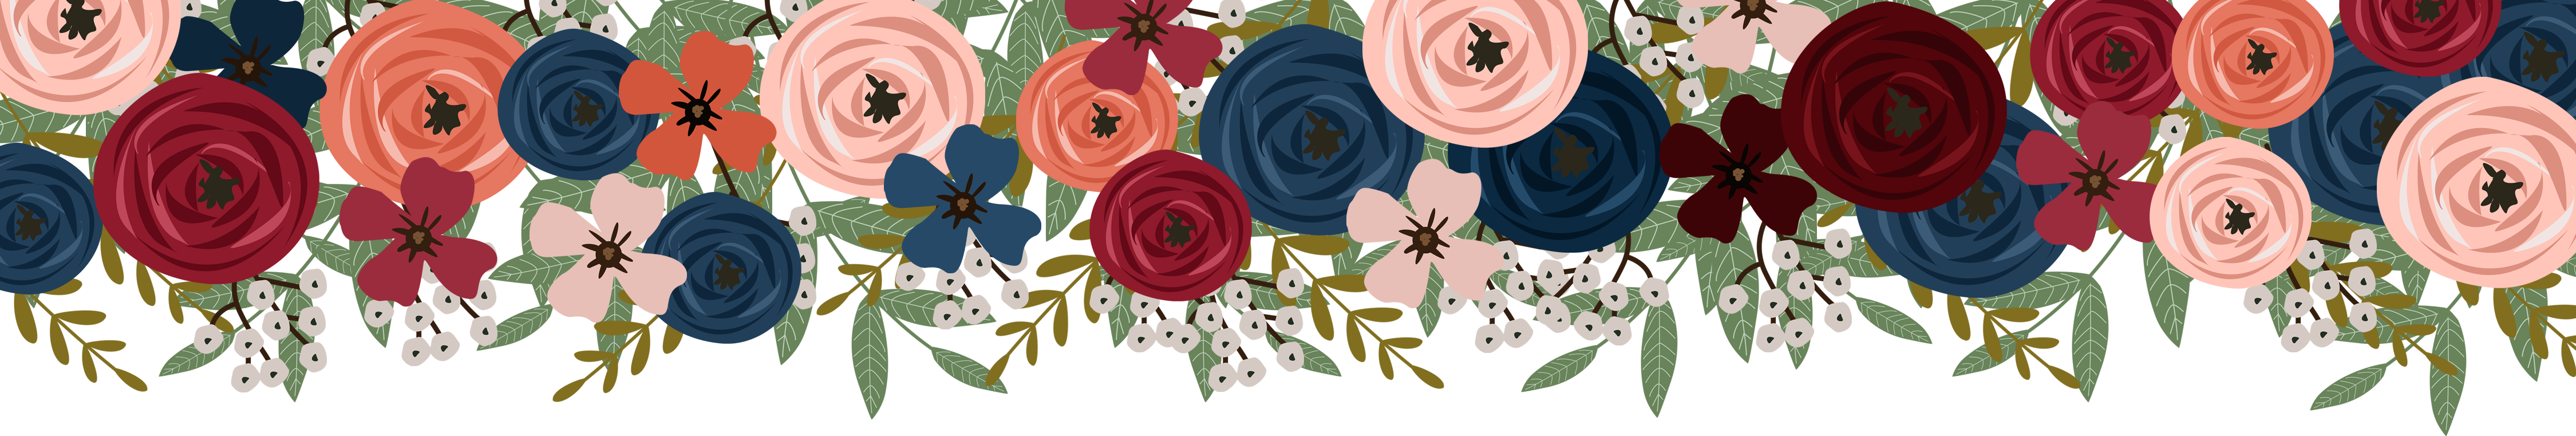 jennyL_blossom_party_bouquet10.png